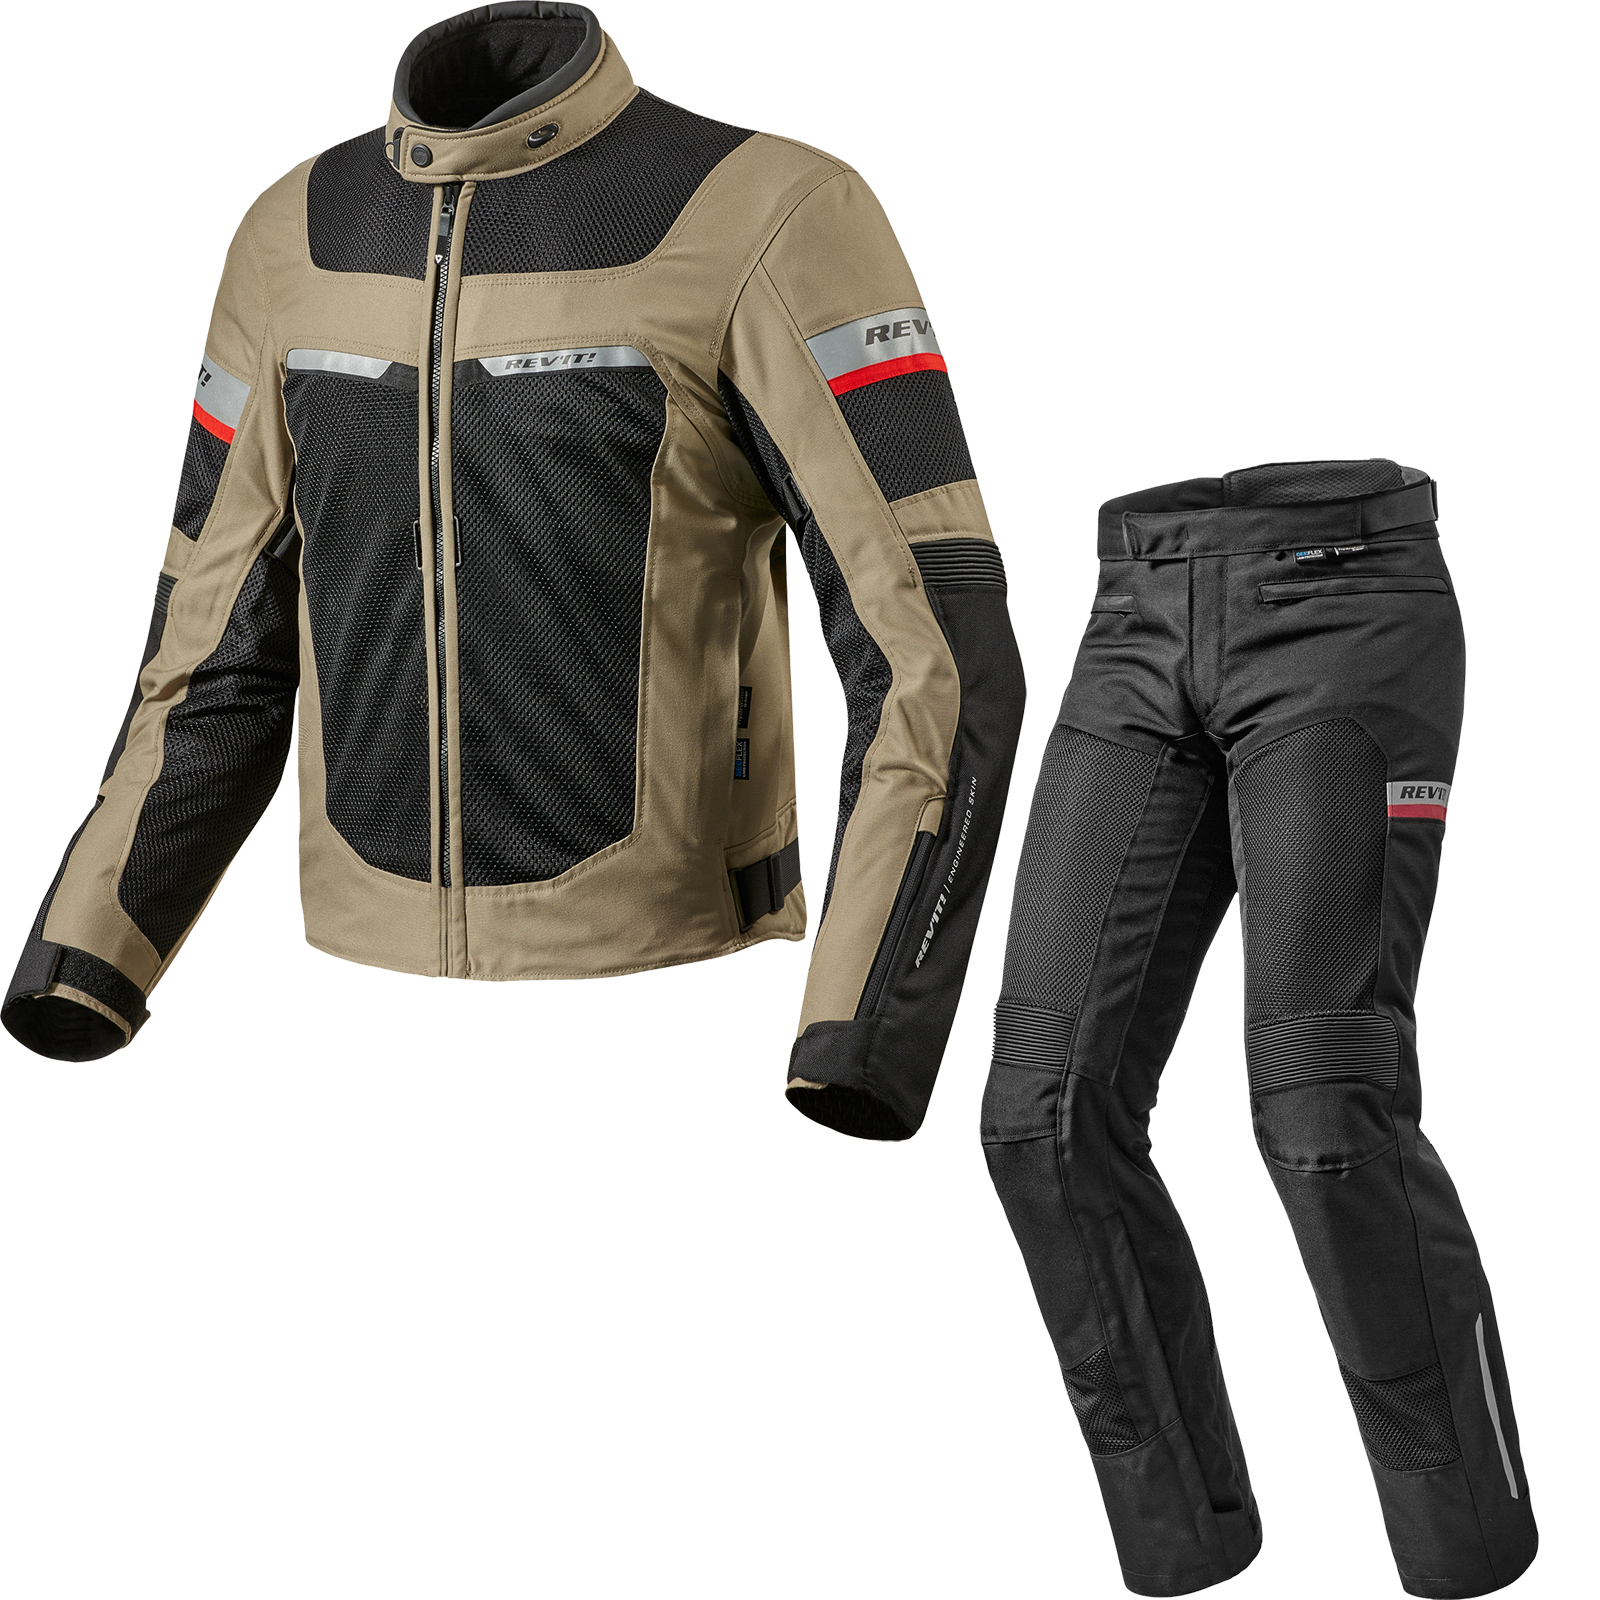 Rev It Tornado 2 Motorcycle Jacket Trousers Sand Black Kit Textile